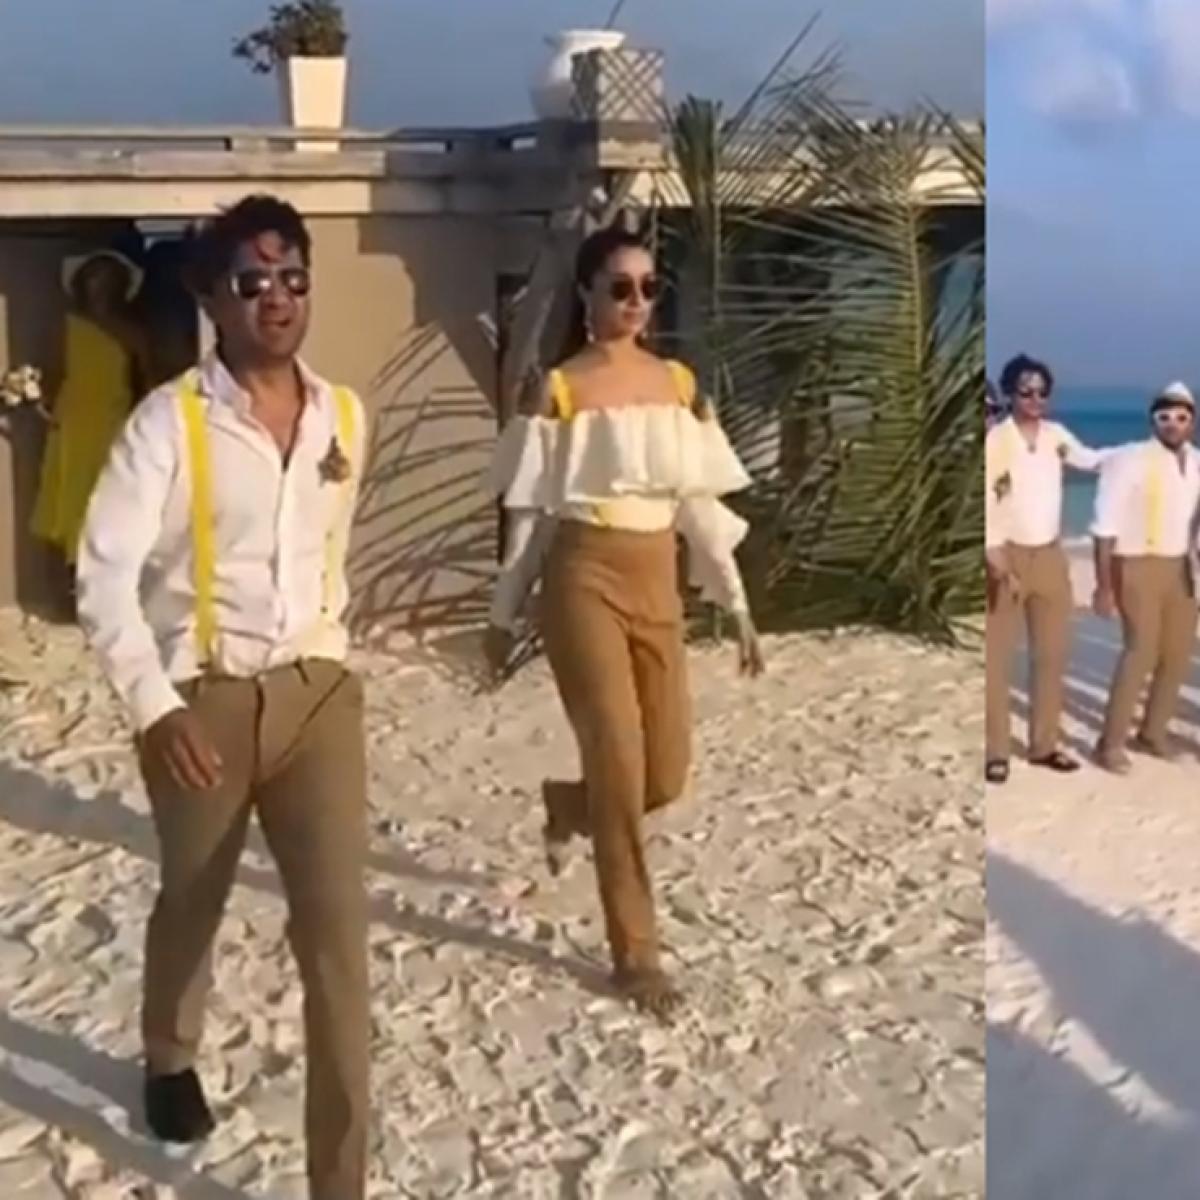 Watch: Shraddha Kapoor turns 'best man' for cousin Priyaank Sharma's wedding in Maldives